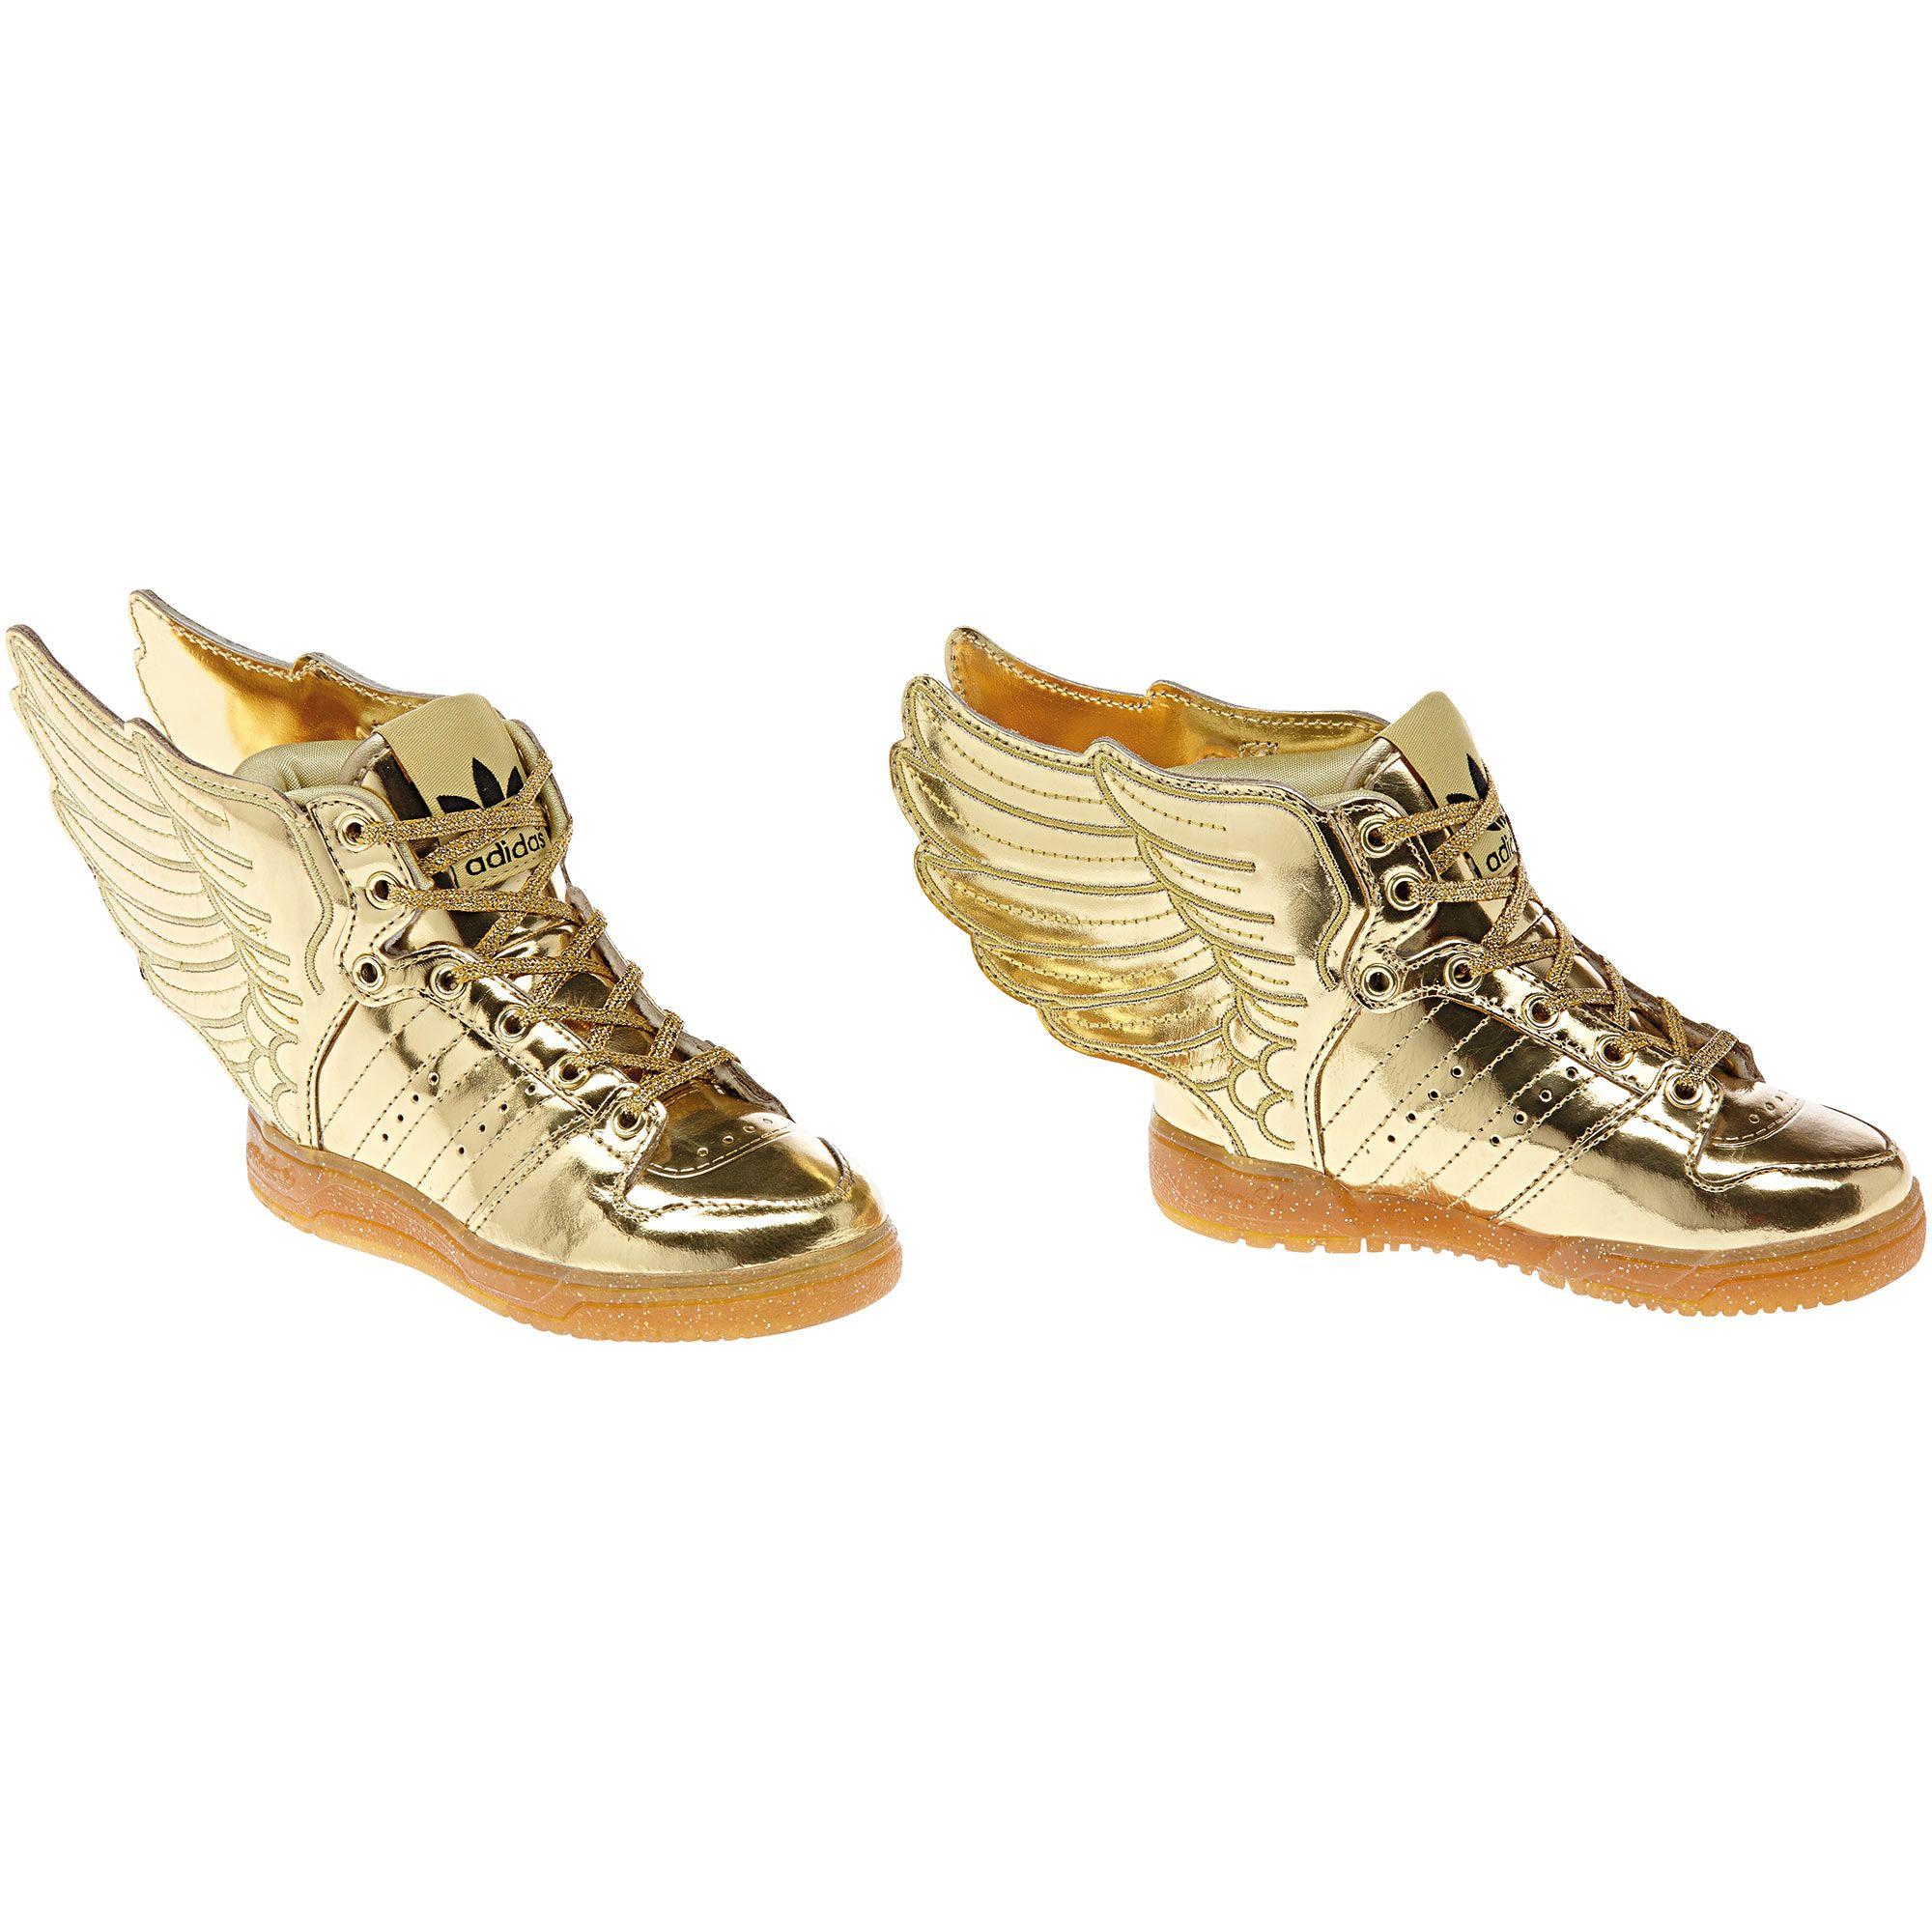 gold shoes for infants